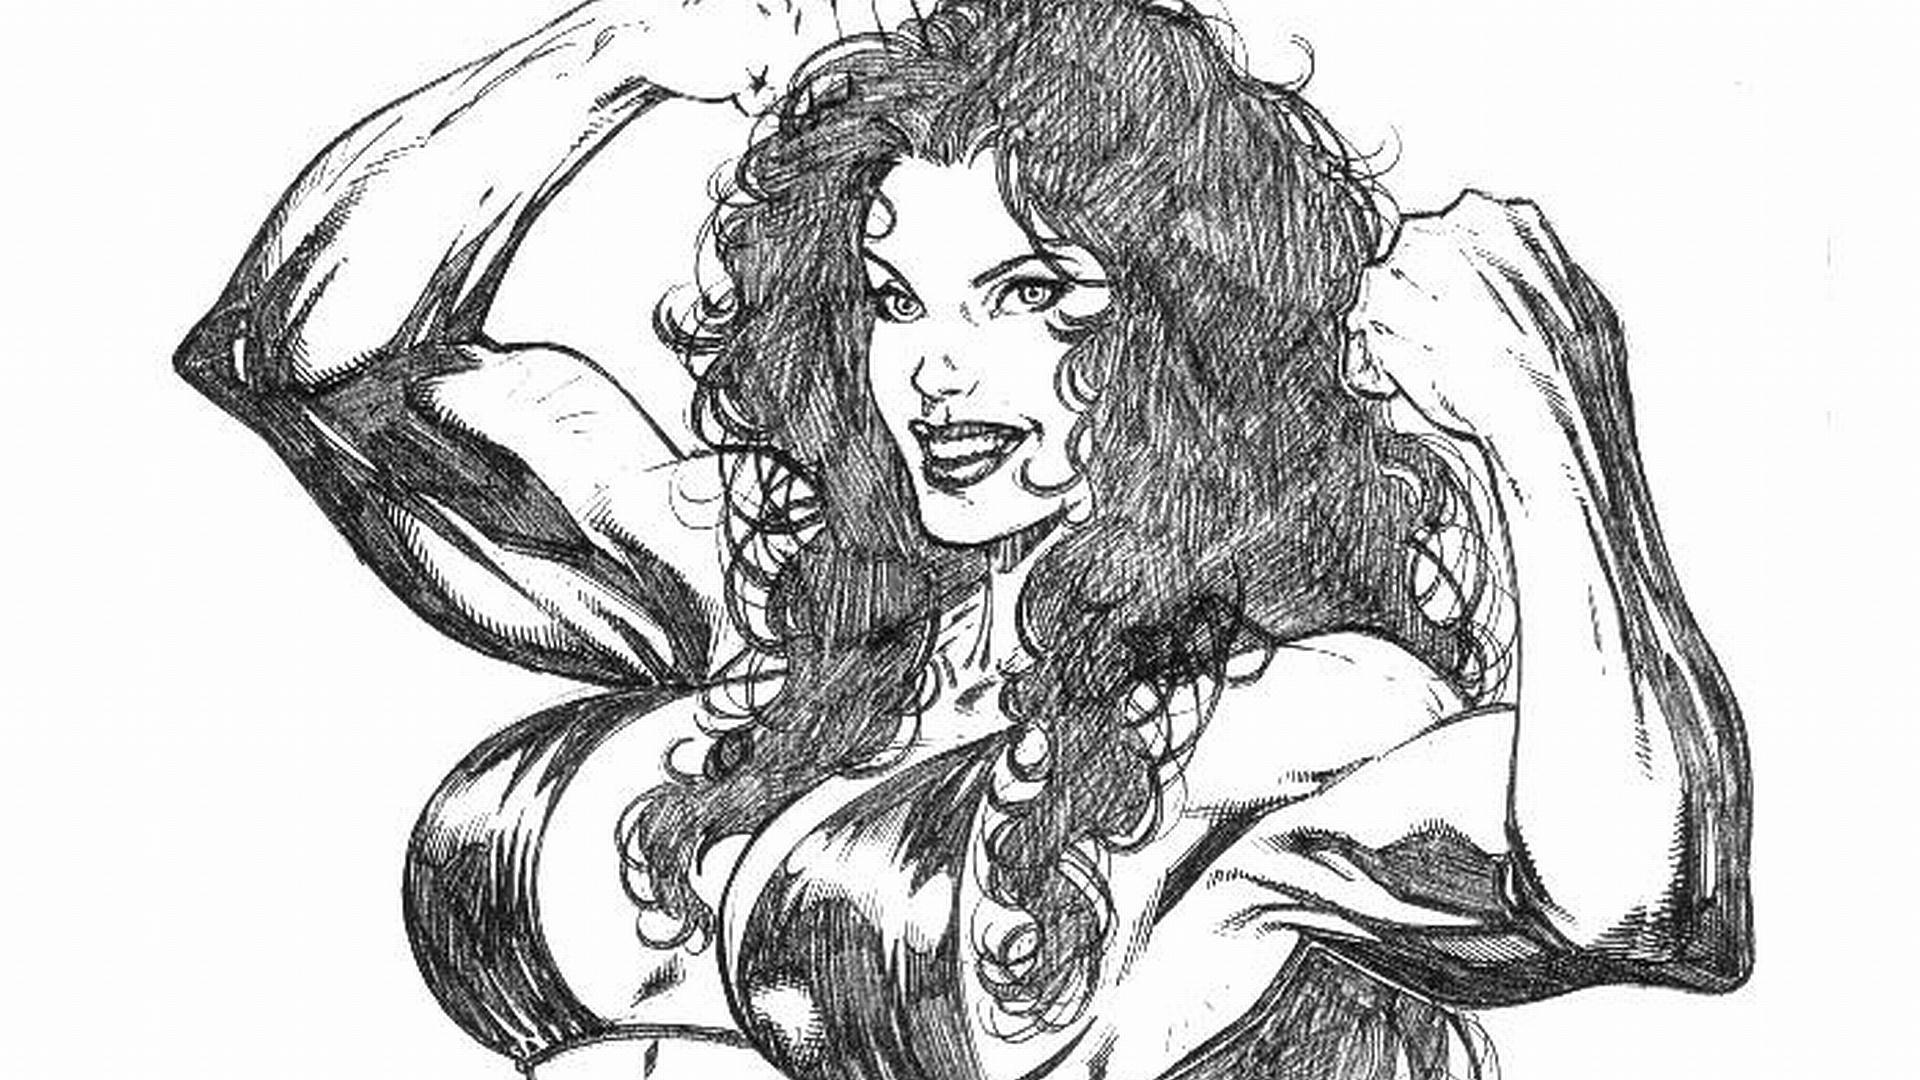 She-Hulk Comics wallpapers HD quality